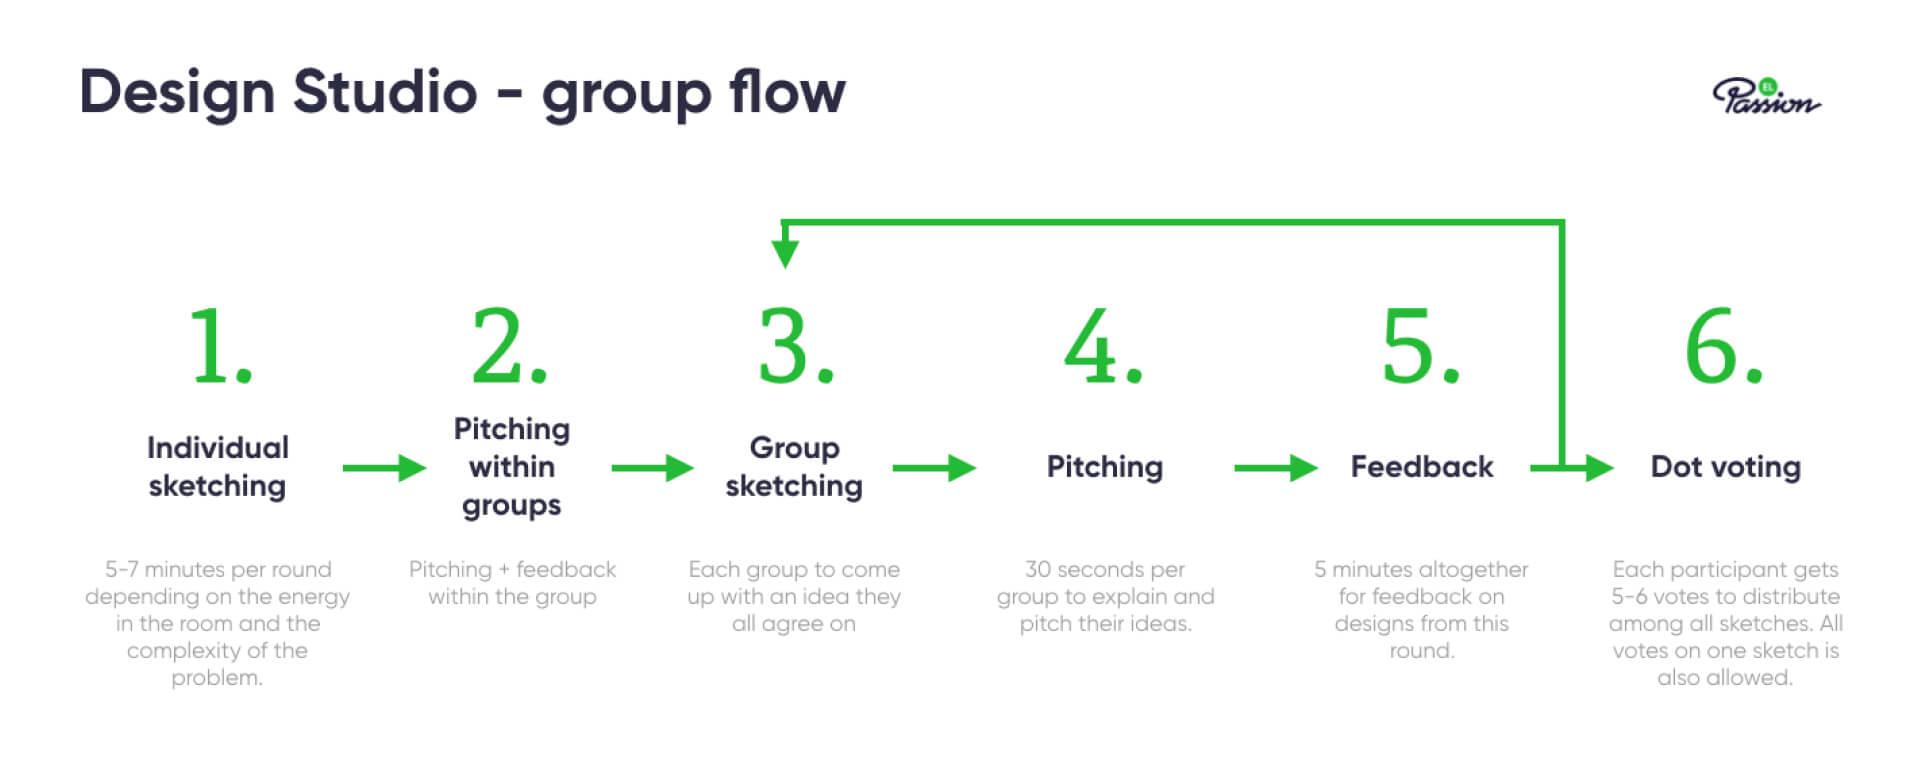 group_flow_design_studio